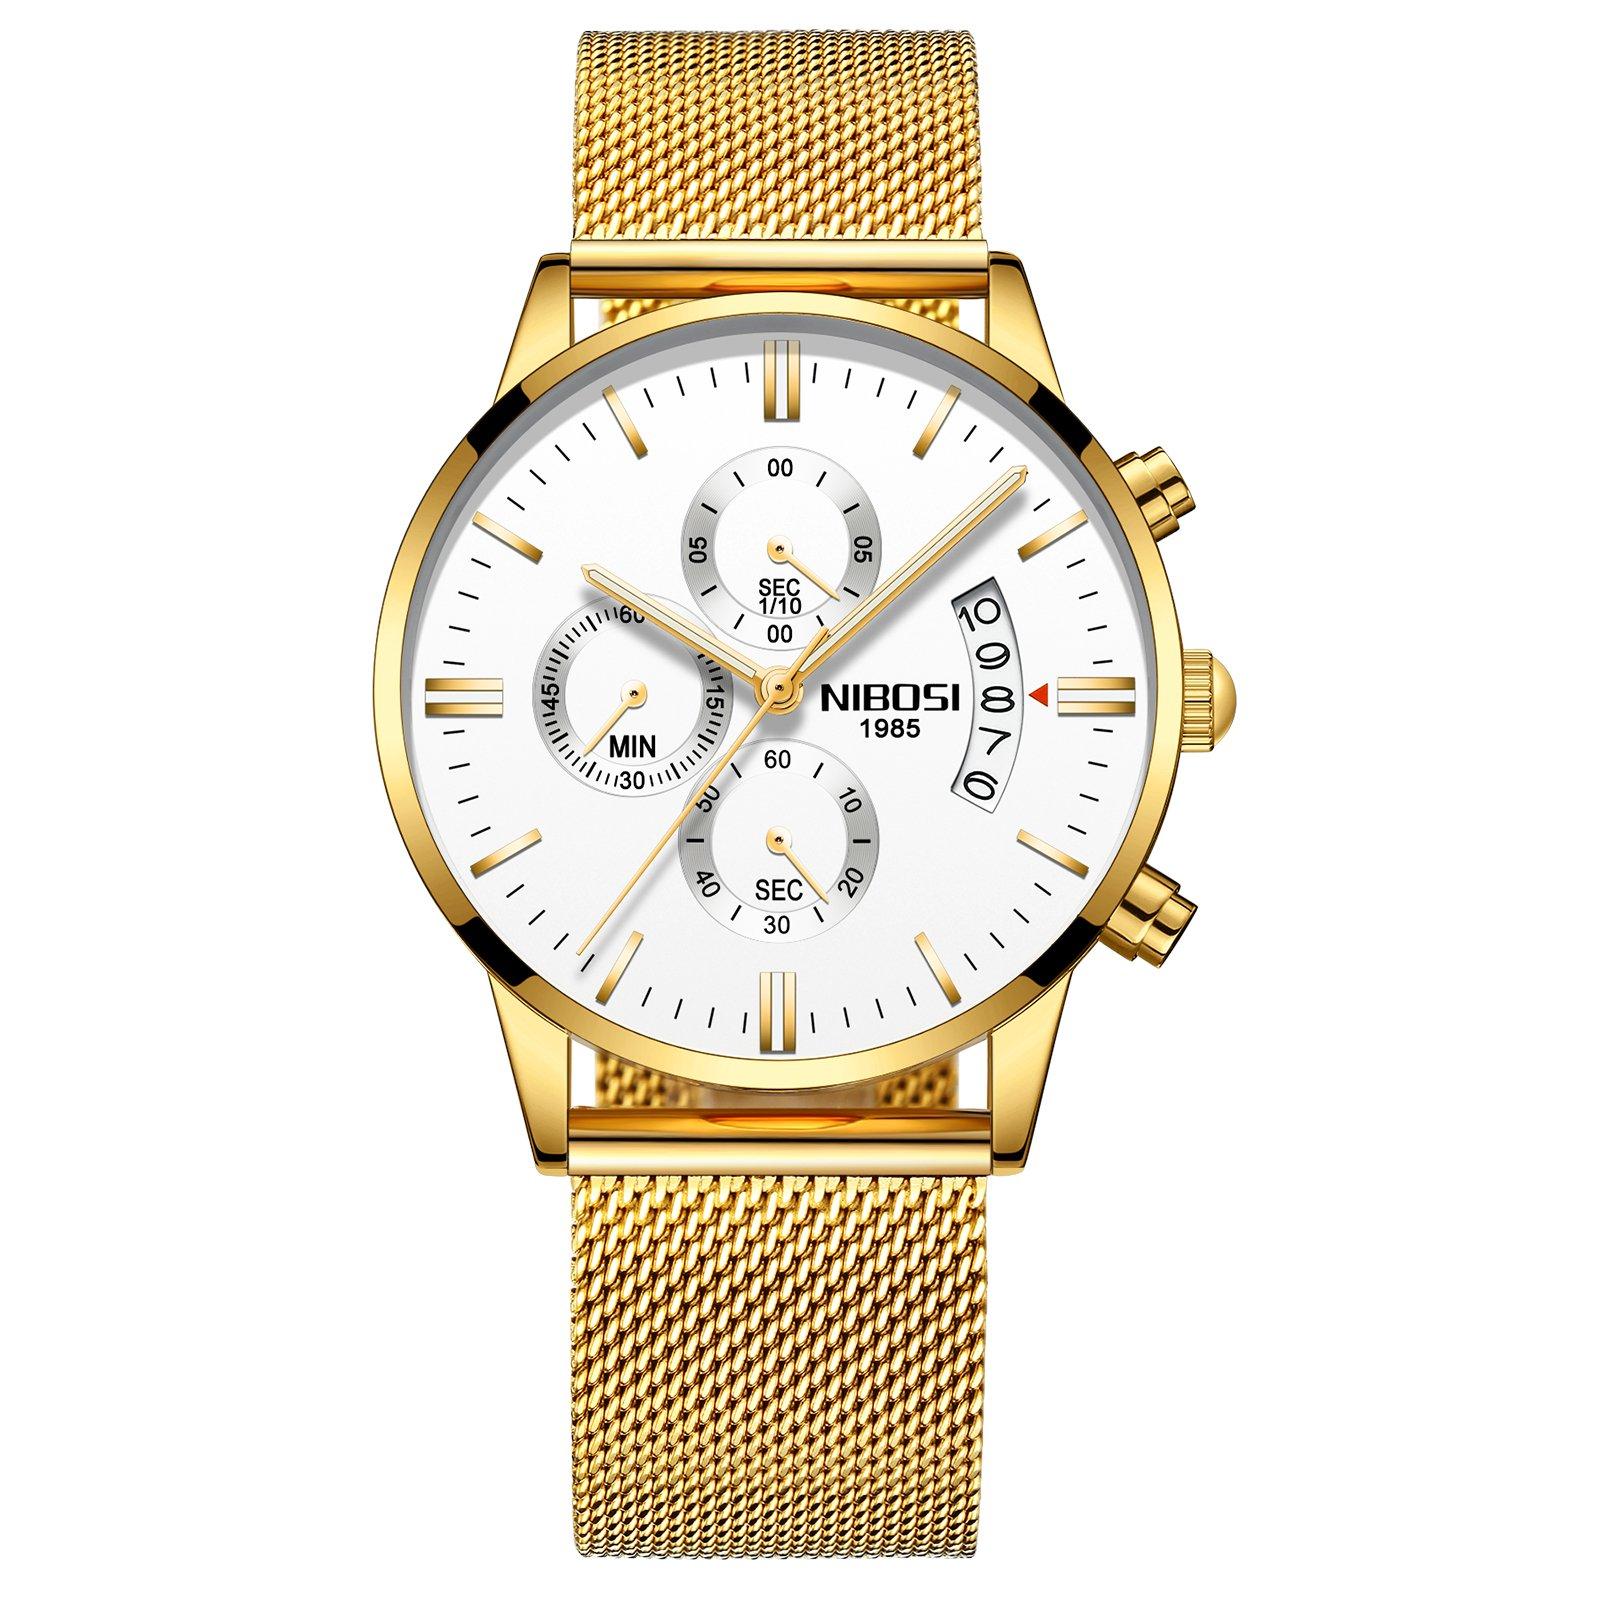 NIBOSI Men's Watches Luxury Chronograph Calendar Waterproof Military Quartz Wristwatches for Men Mesh Alloy Milanese Style Bracelet 2309-QJBMwd